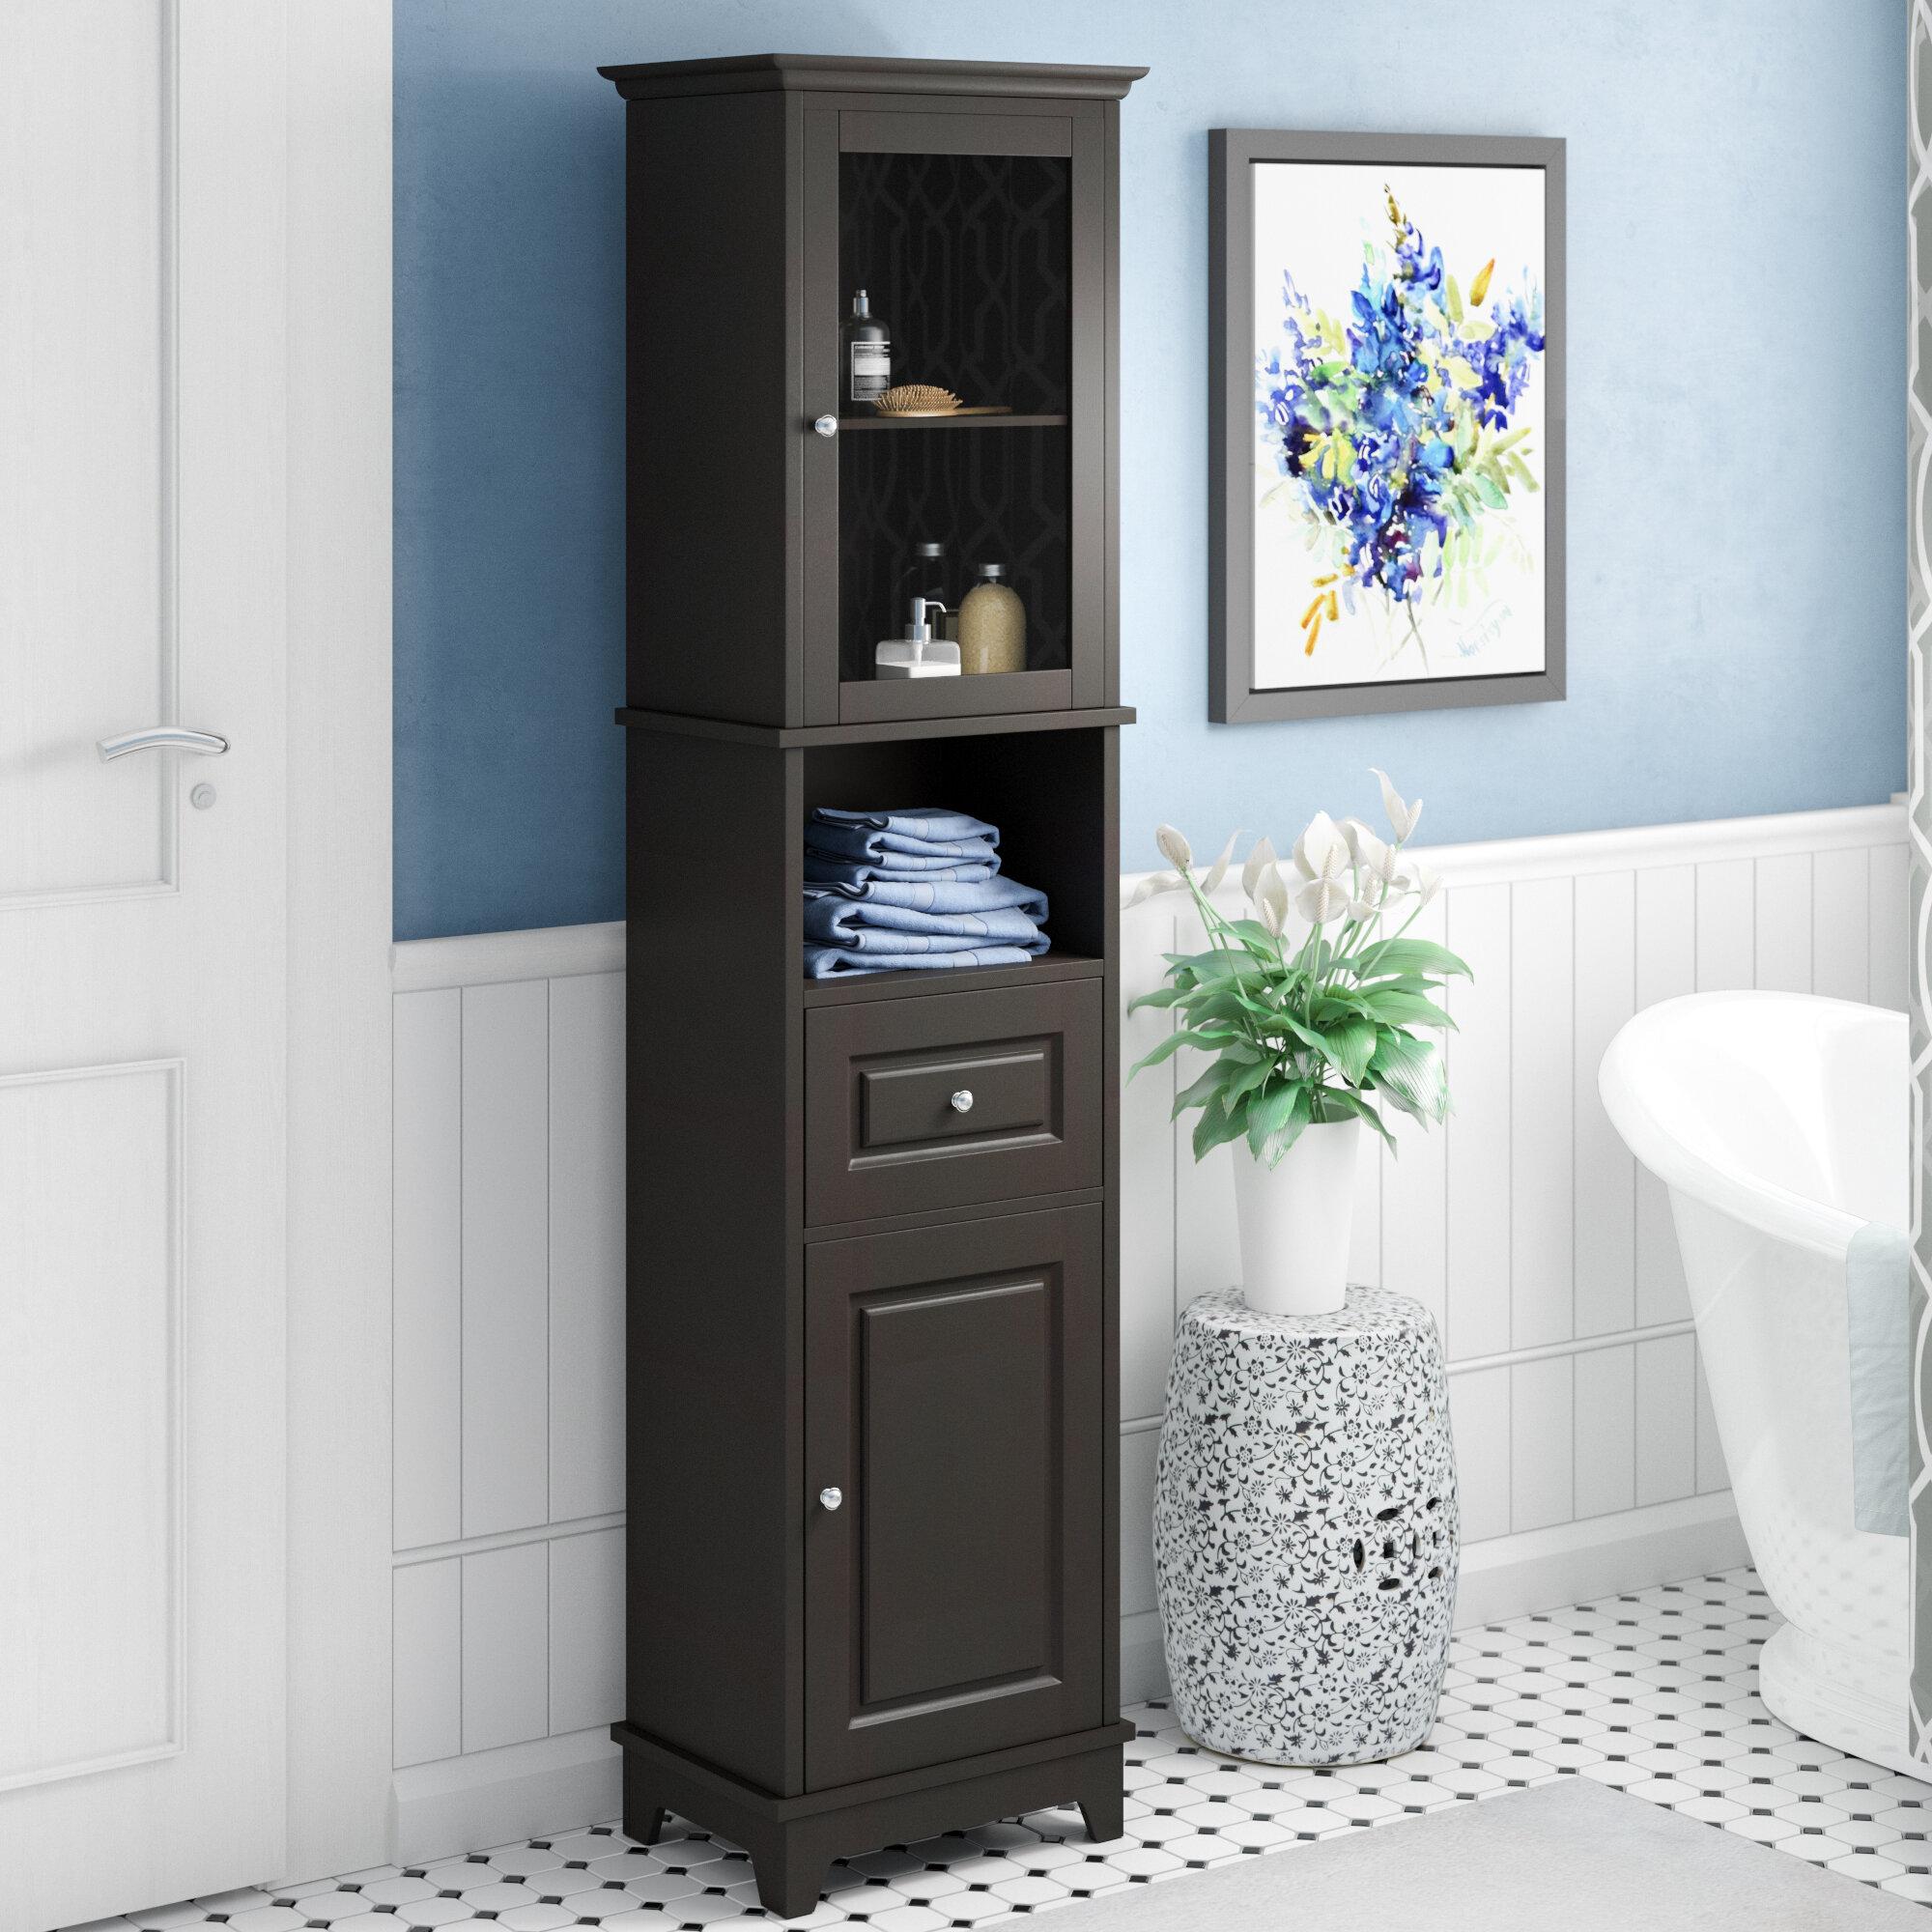 Three Posts New Paltz 18 11 X 70 87 Linen Storage Tower Reviews Wayfair Ca